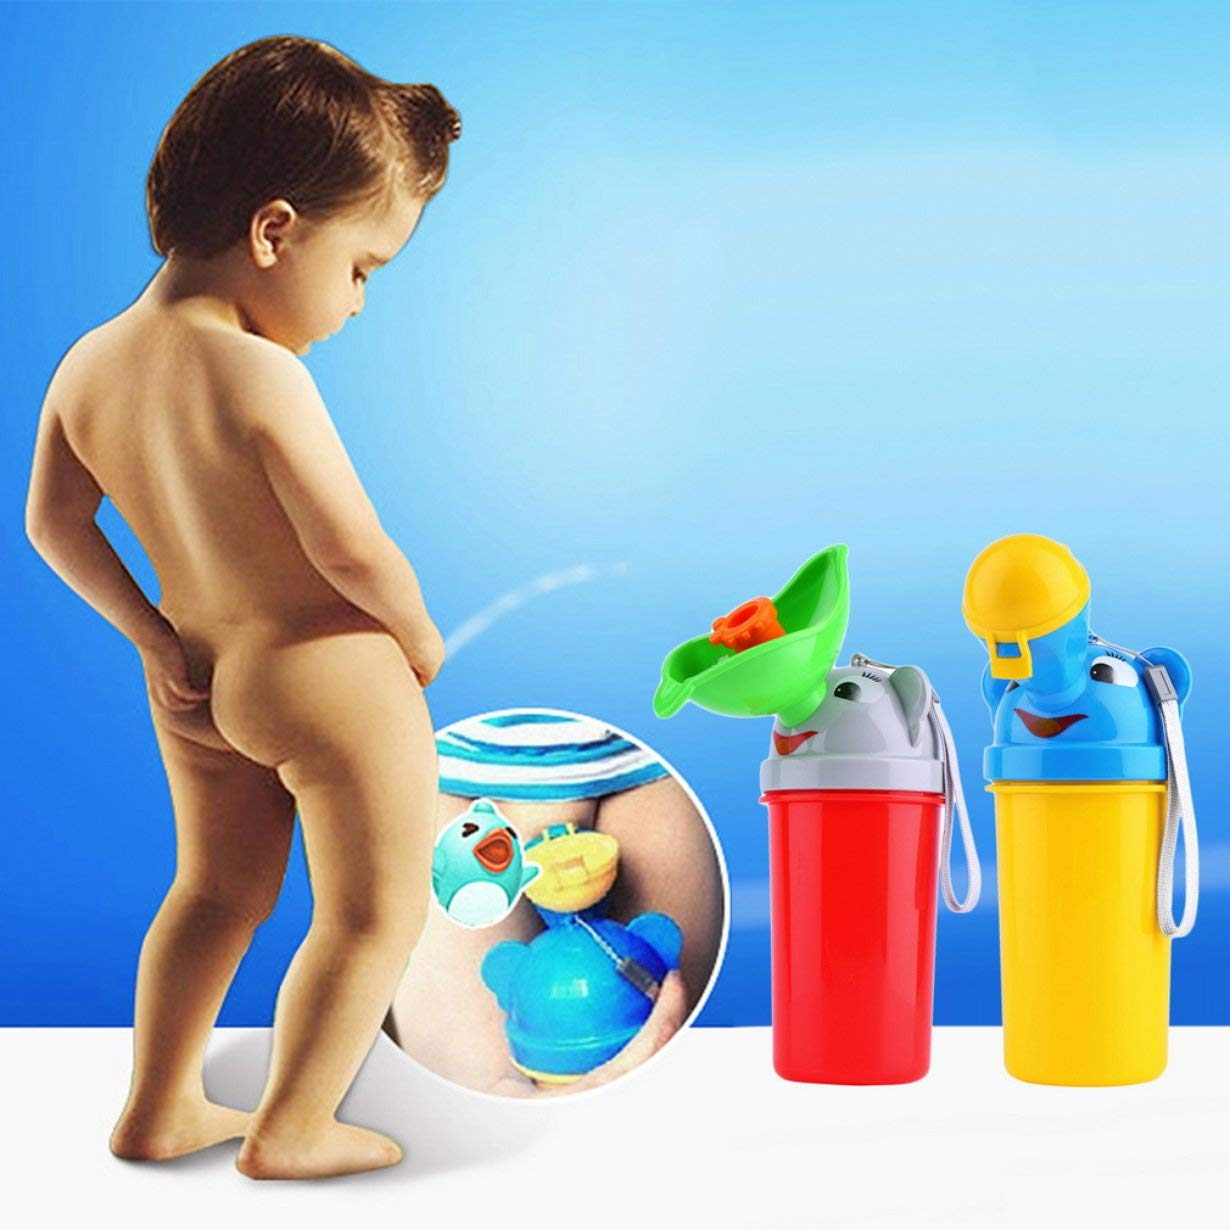 Tragbare Baby-Spielraum Pissoir Auto-WC Outdoor-Camping-Jungen-M/ädchen-Kind-T/öpfchen